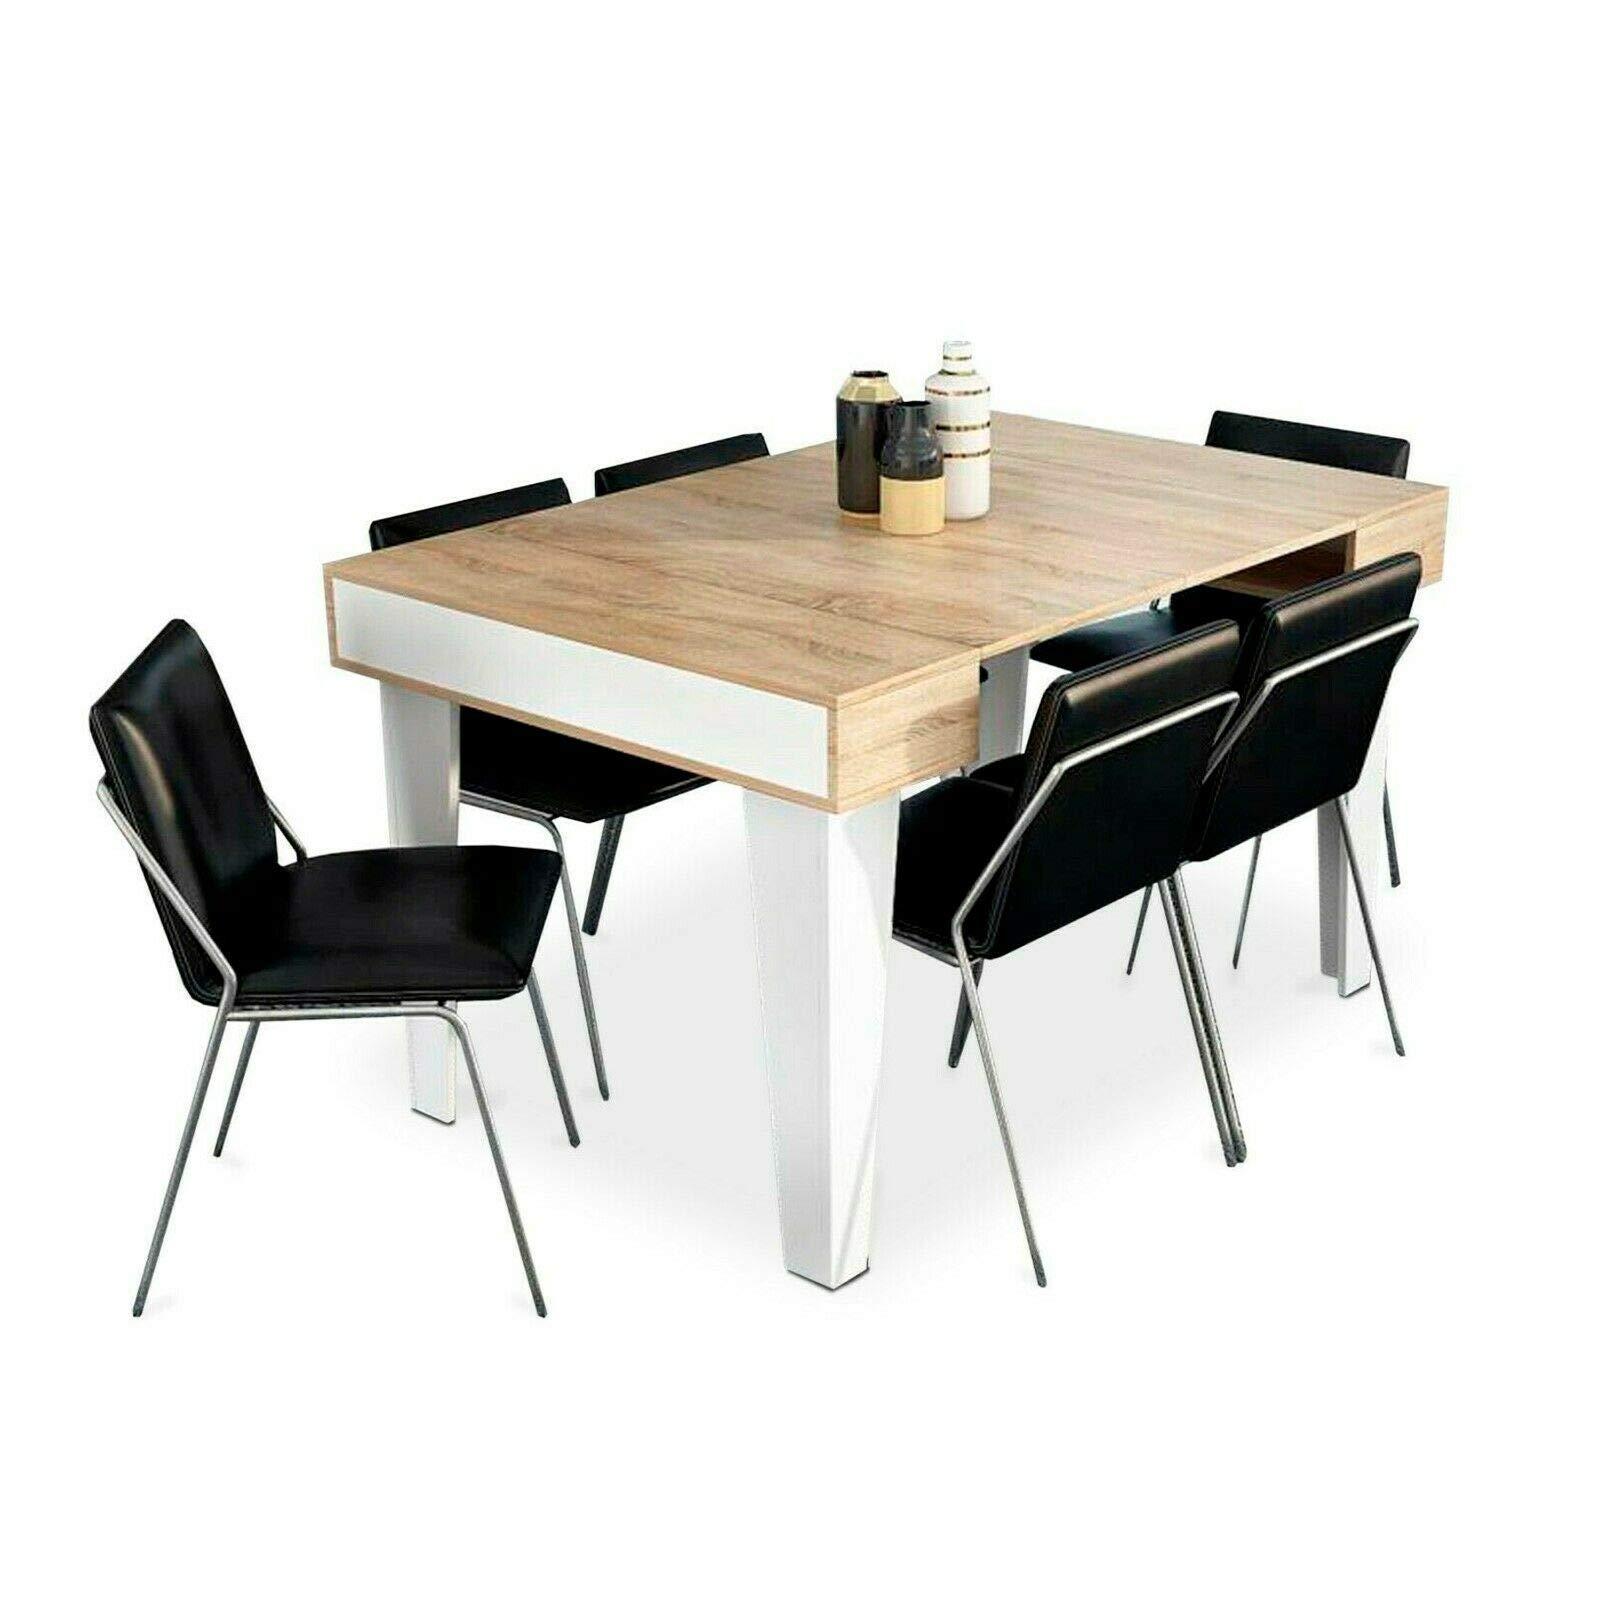 Comfort Products SelectionHome - Mesa Consola Comedor, Mesa Cocina o recibidor Acabado en Blanco Mate y Roble Cepillado, Modelo KL Nordic, Medidas 52-140 x 90 x 79 cm de Alto: Amazon.es: Hogar